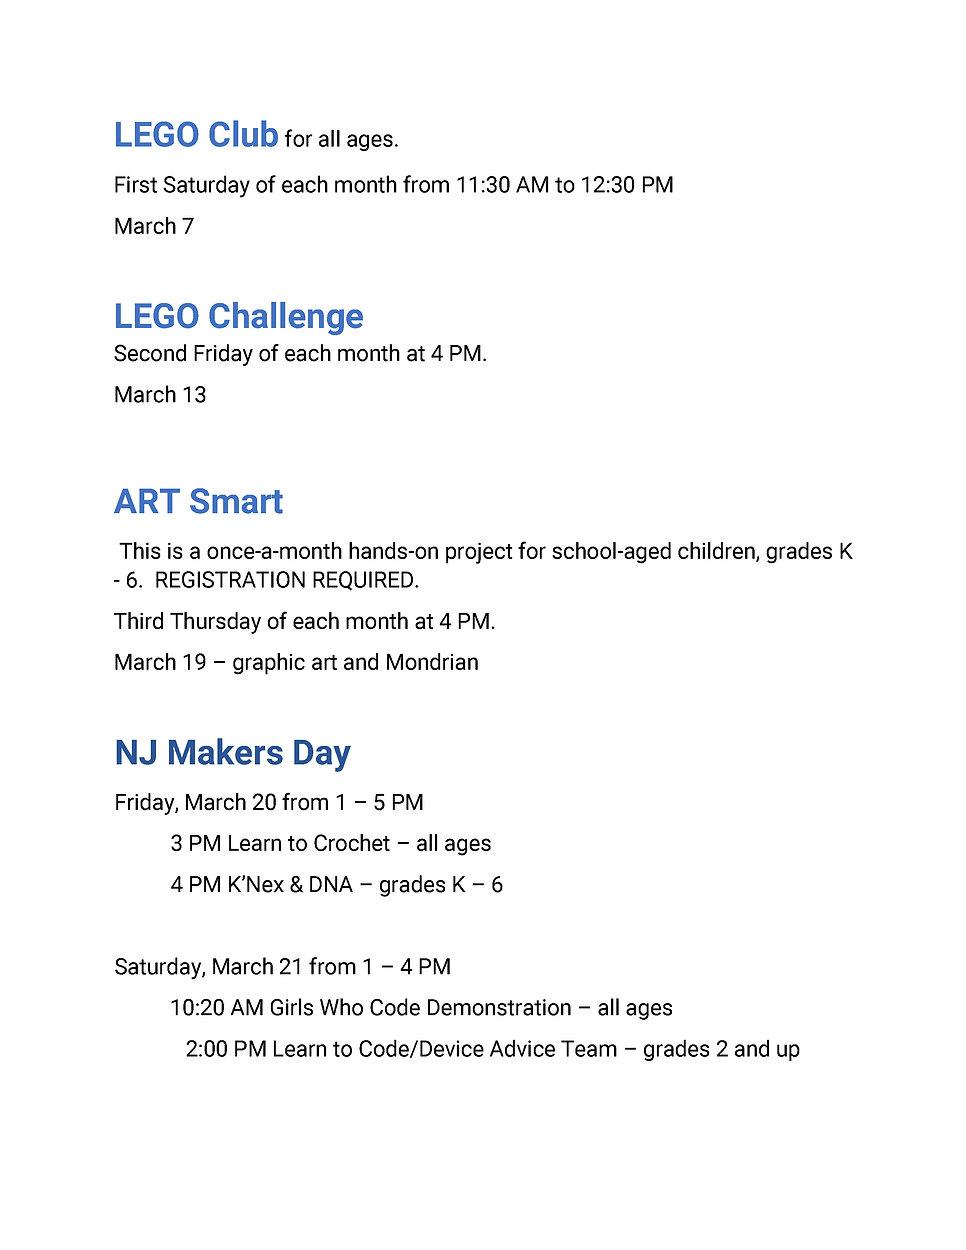 CHILDREN'S PROGRAMS March 2020_Page_2.jp